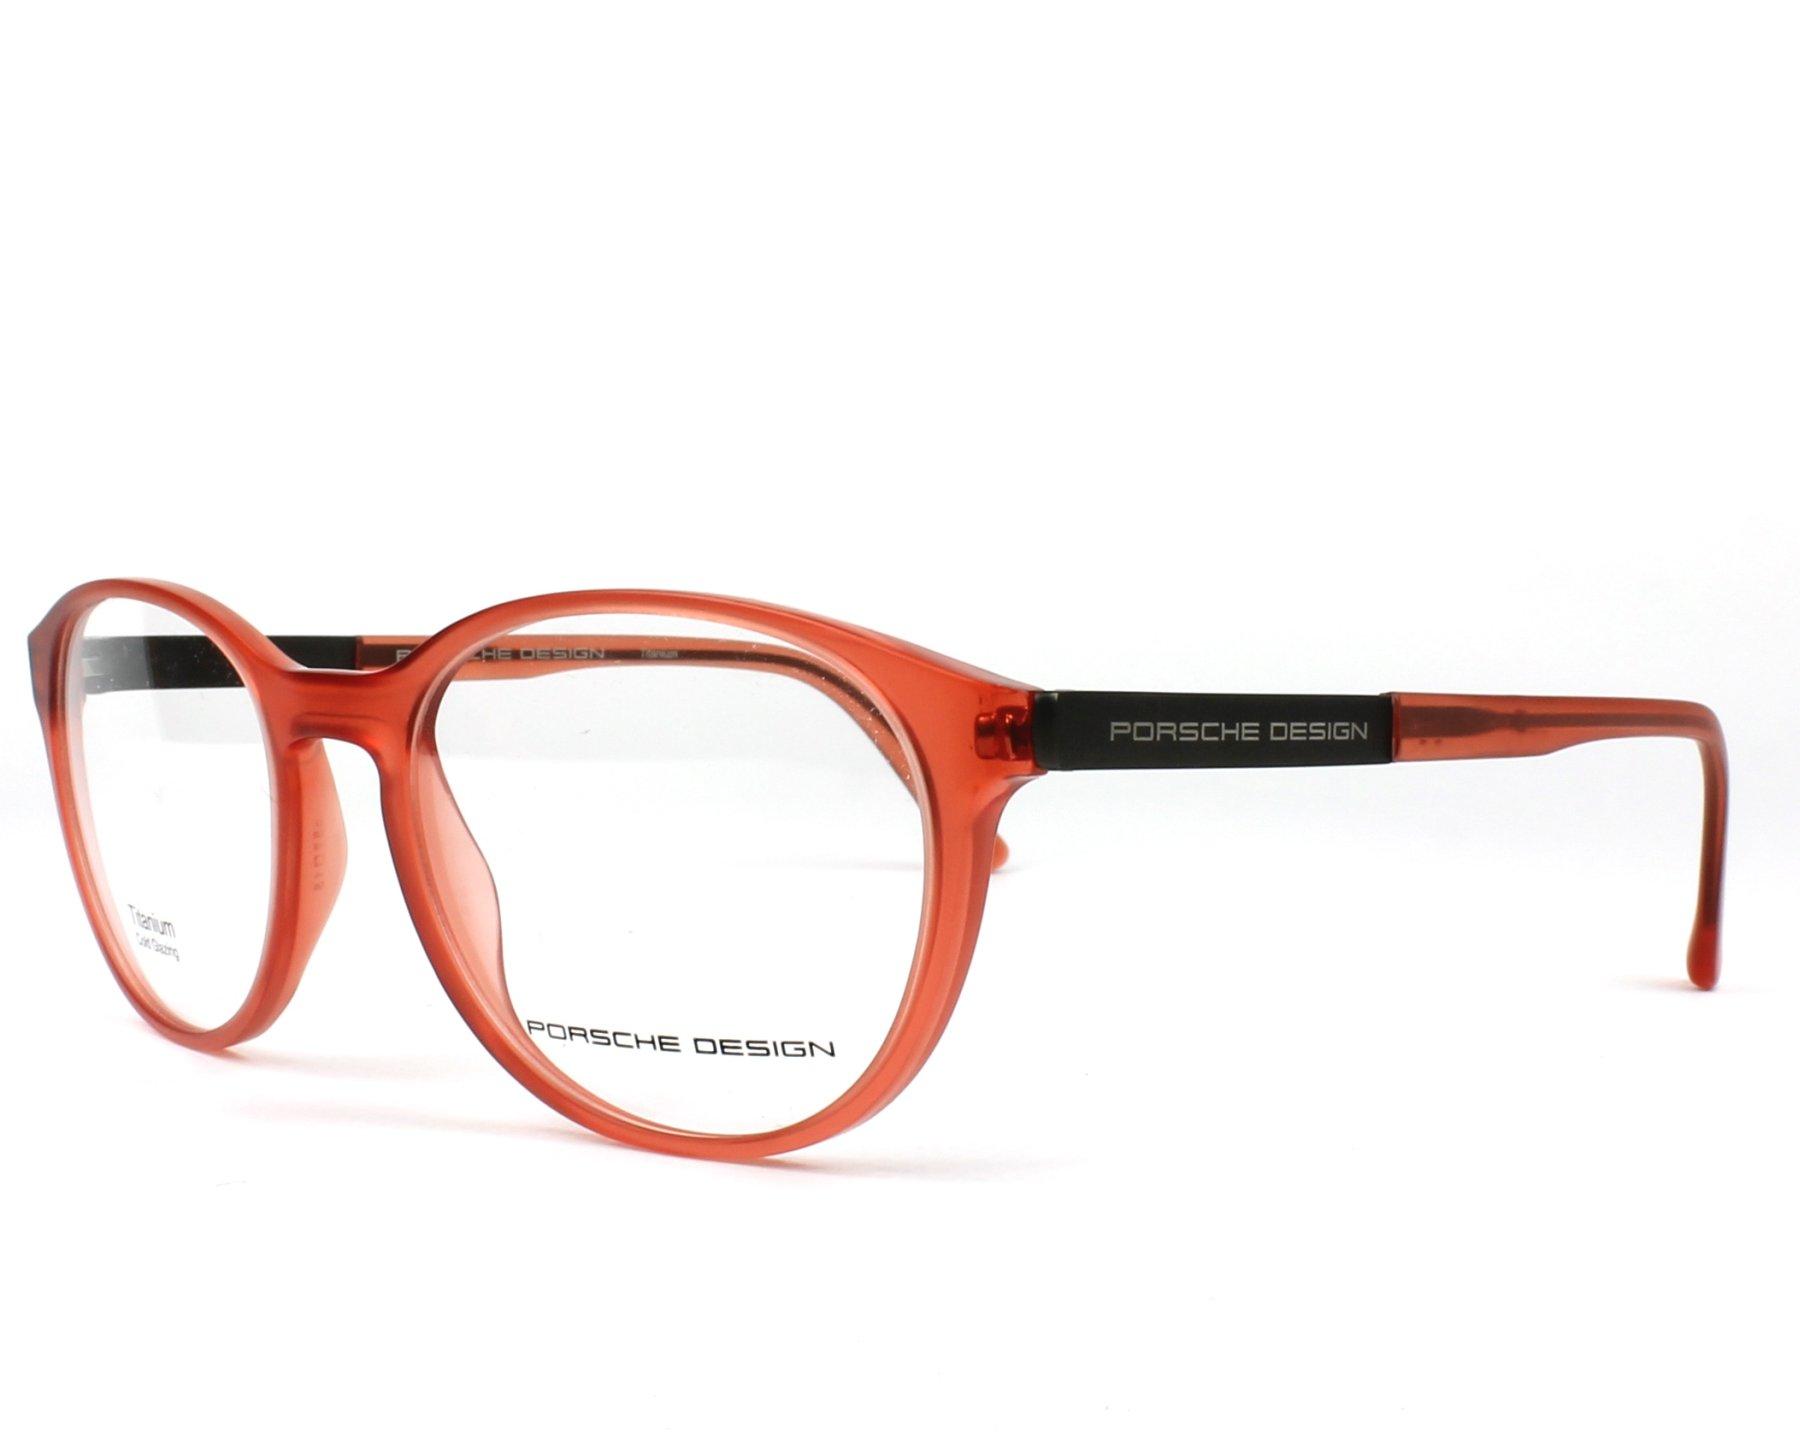 Porsche Design Eyeglasses P 8261 C Red Visionet